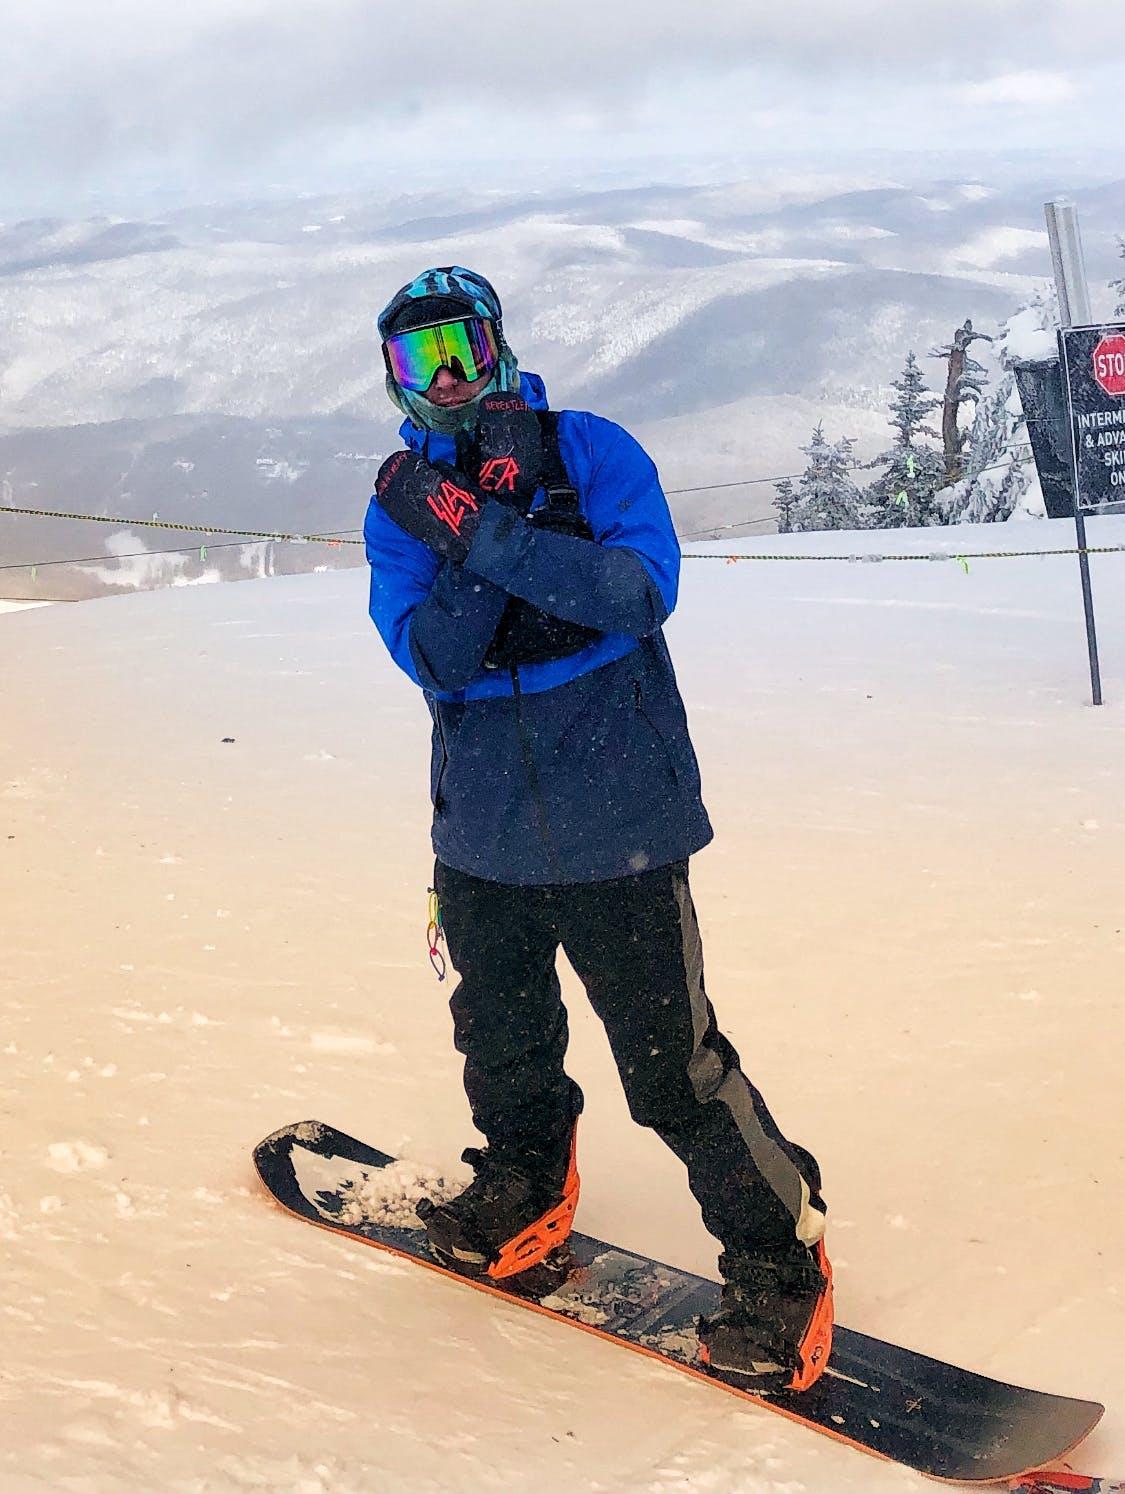 Snowboard Expert Bobby Chadderton